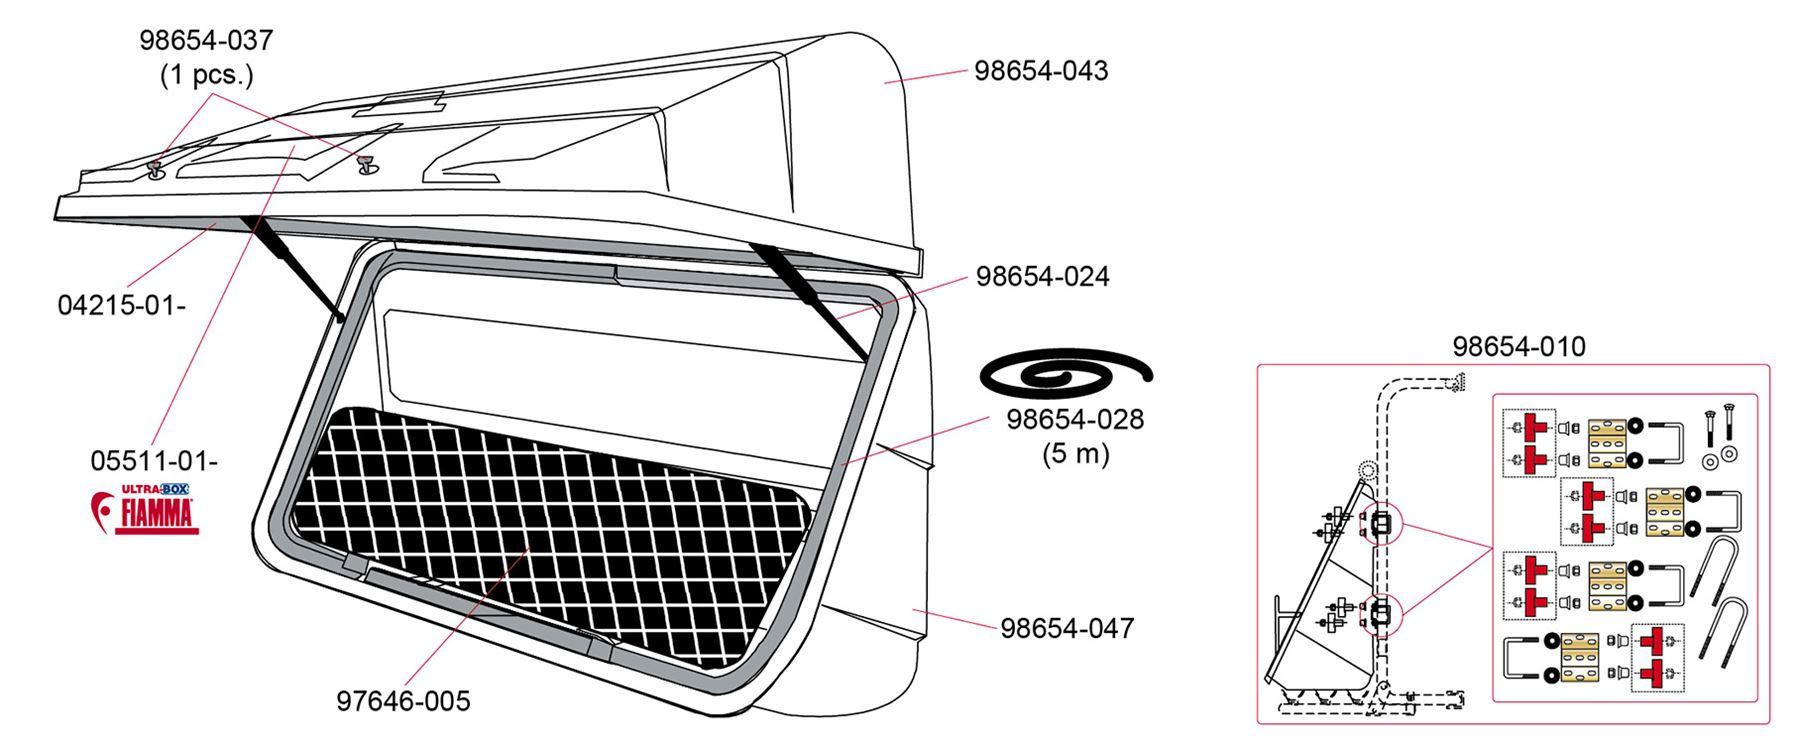 Fiamma Ultra Box 500 Rear Mount Storage Caravan Motorhome Carry Bike European House Wiring Diagrams Item Specifics